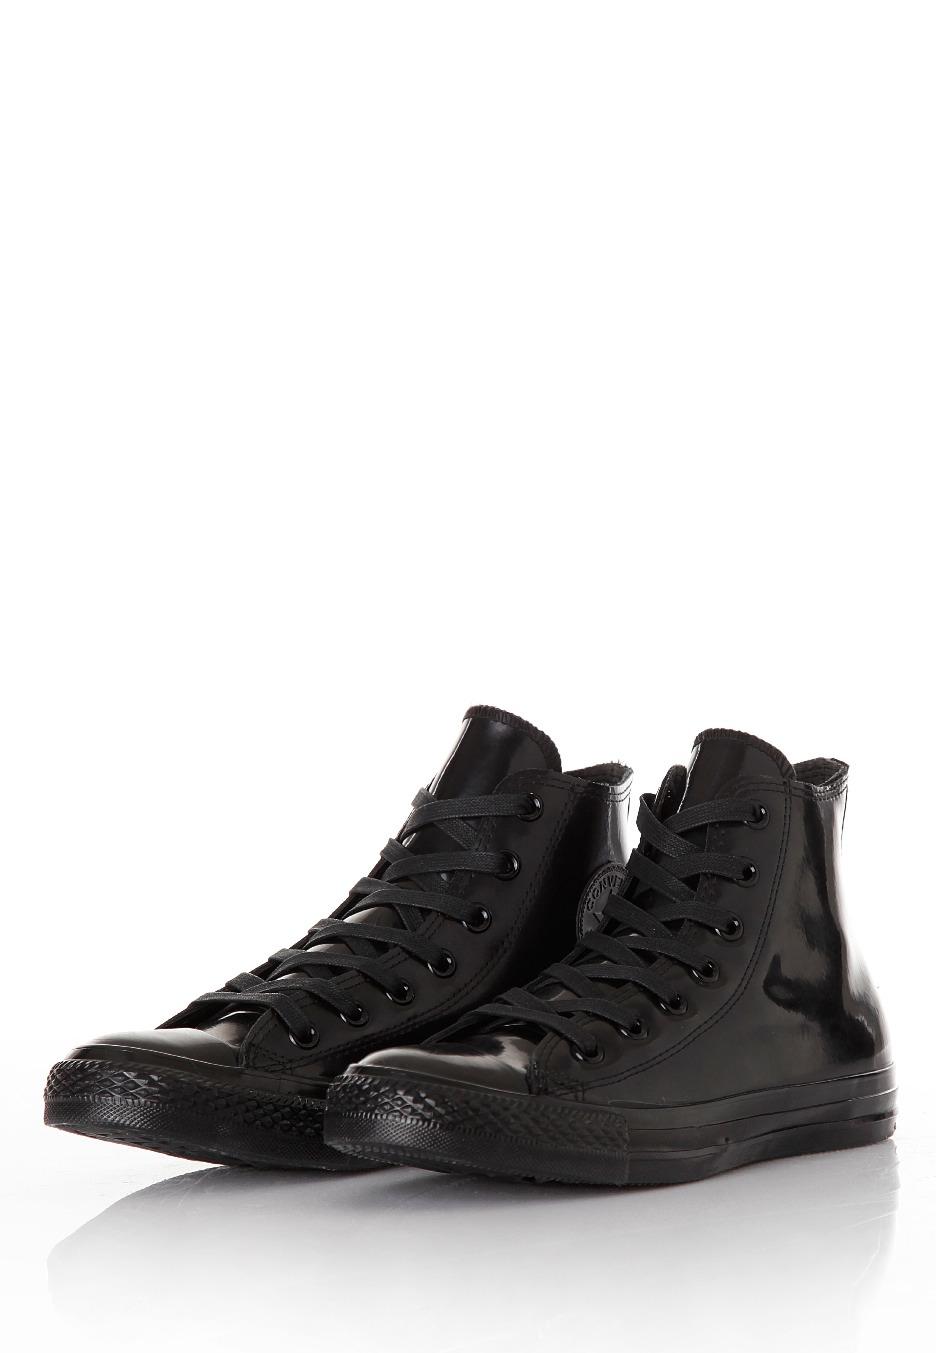 0e52717037d8 Converse - Chuck Taylor All Star Rubber - Girl Shoes - Impericon.com UK